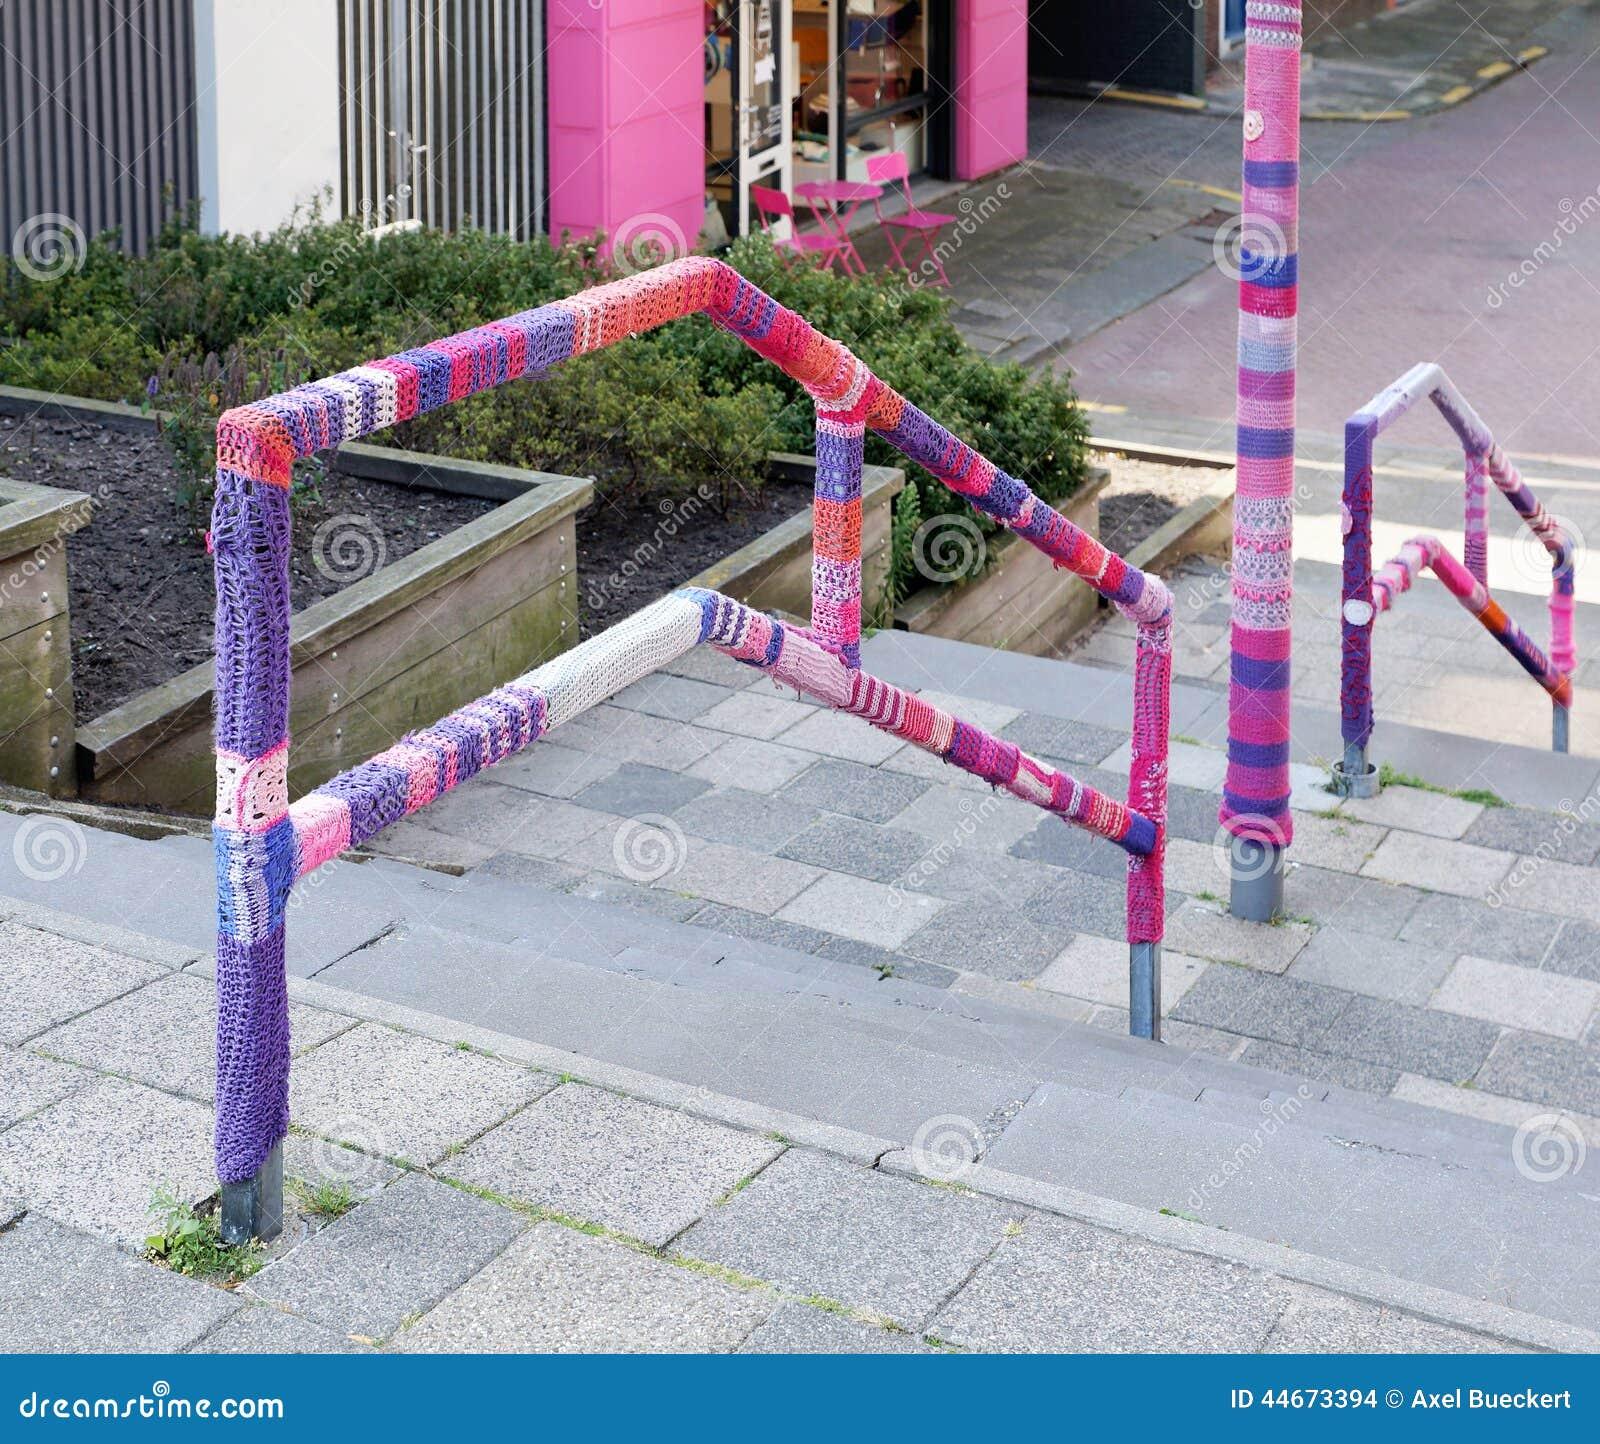 Urban Knitting Graffiti : Urban knitting street art stock photo image of knit